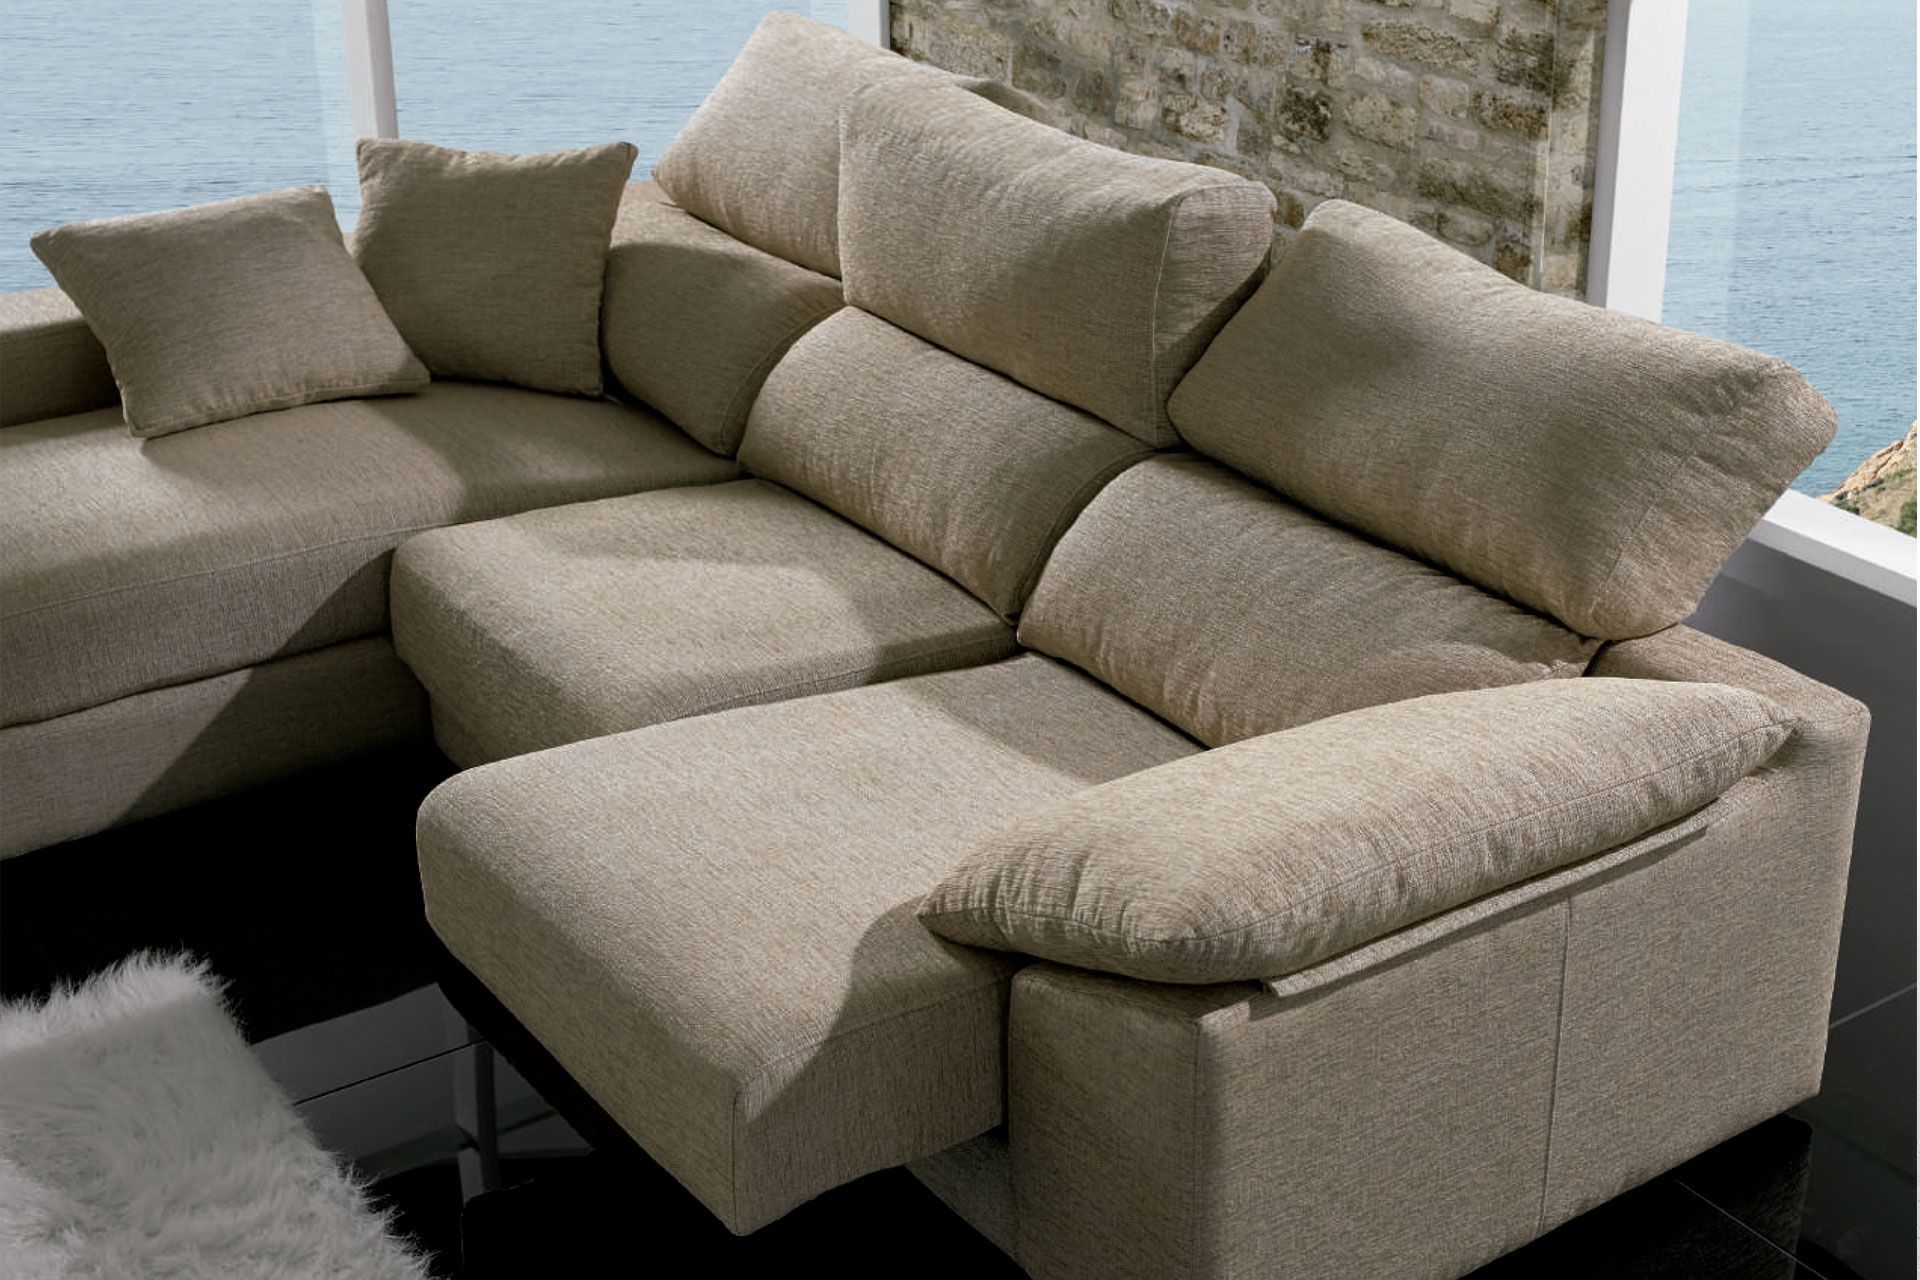 sofa huelva, tiendas de sofas en huelva, factory sofa huelva, camas 2 plazas, sonpura, camas de dos plazas,